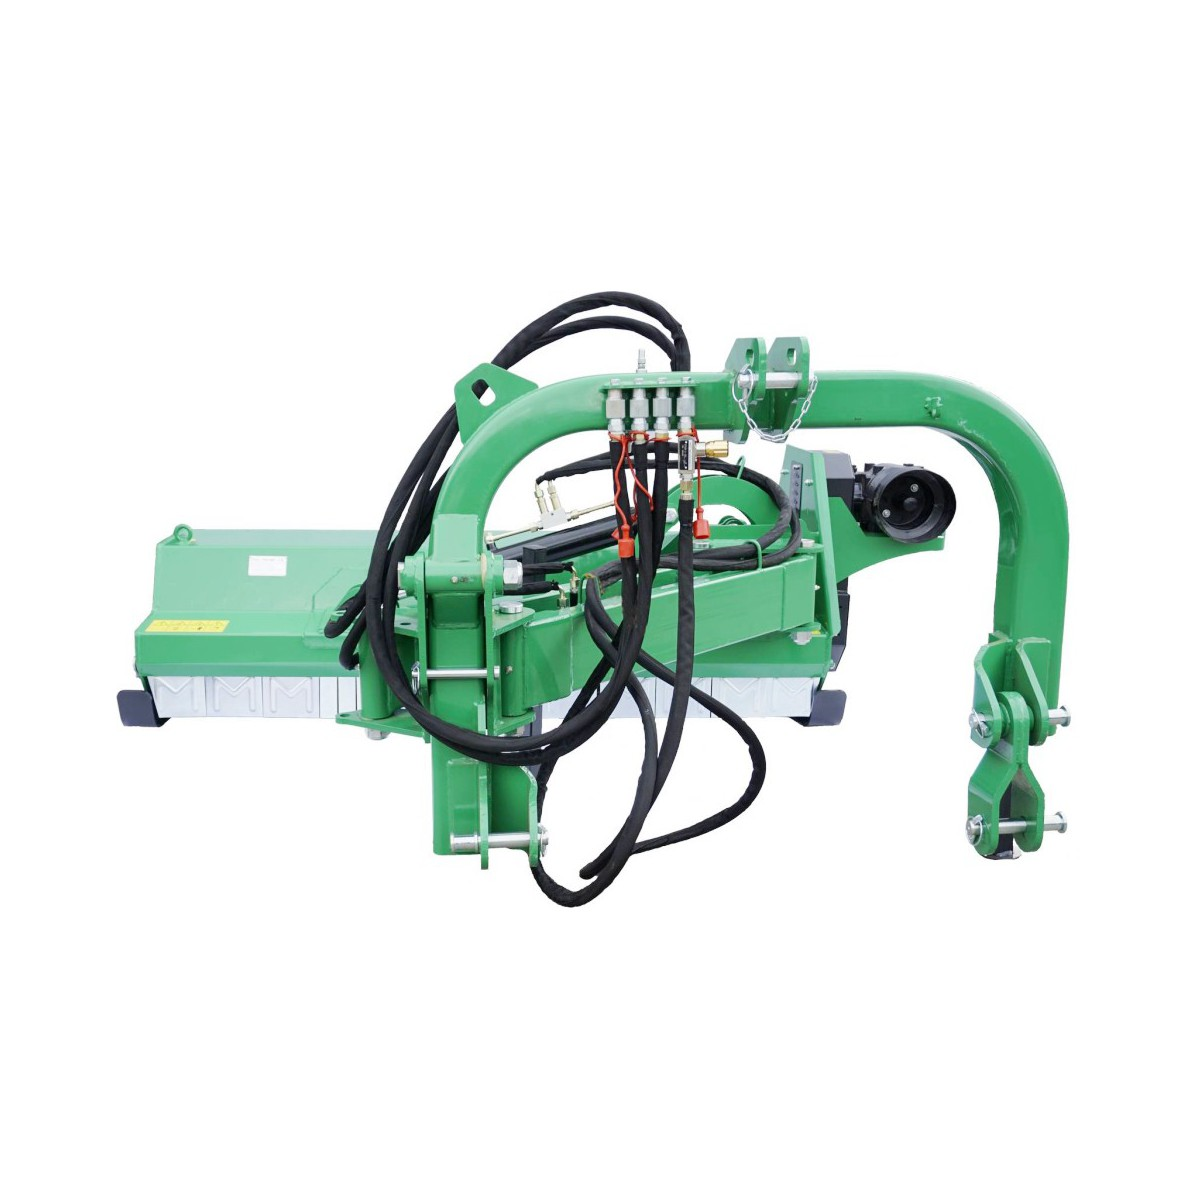 Flail Mower with an outreach arm AGF 160 with valves